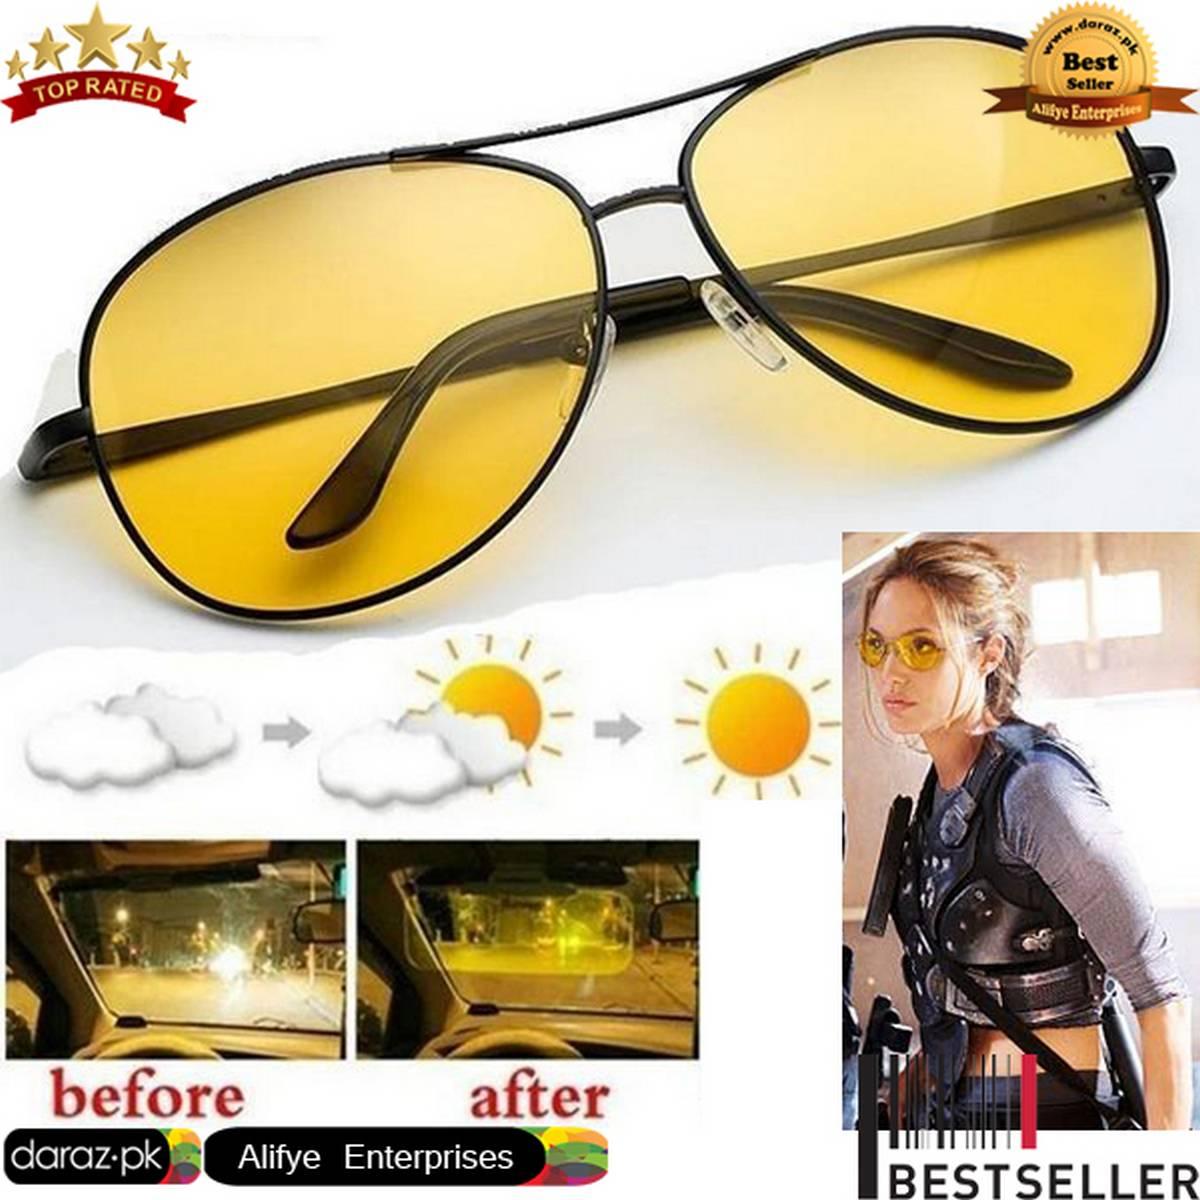 HD Night Vision Glasses Aviator Style Shape Night Driving Glasses Anti Glare Polarized Mens Women Glasses - Yellow